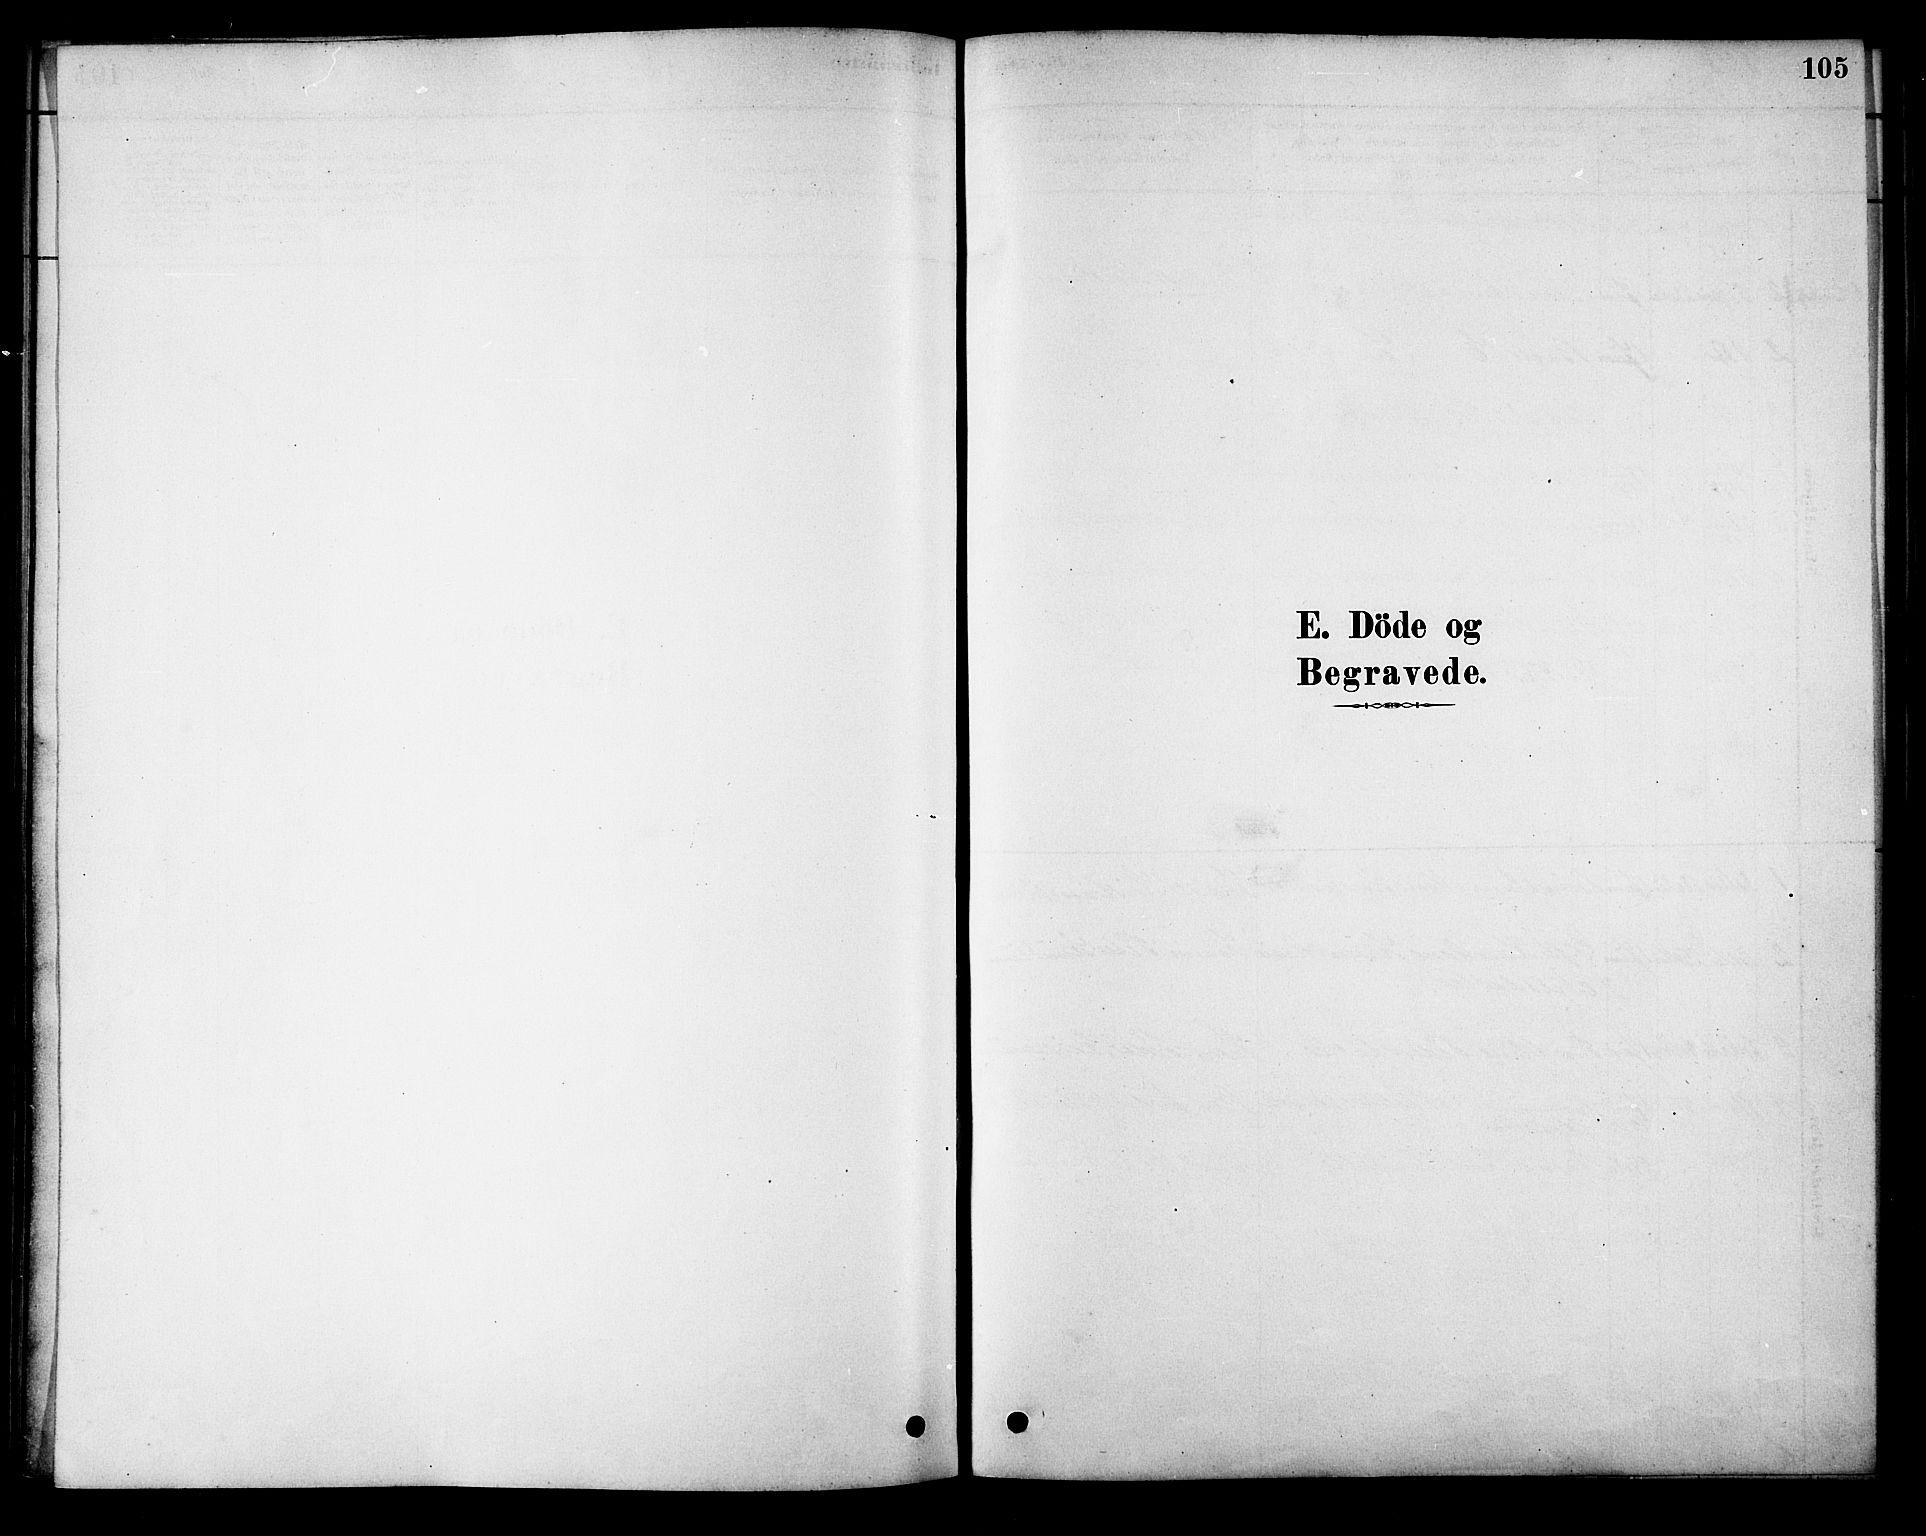 SAT, Ministerialprotokoller, klokkerbøker og fødselsregistre - Nordland, 886/L1219: Ministerialbok nr. 886A01, 1878-1892, s. 105